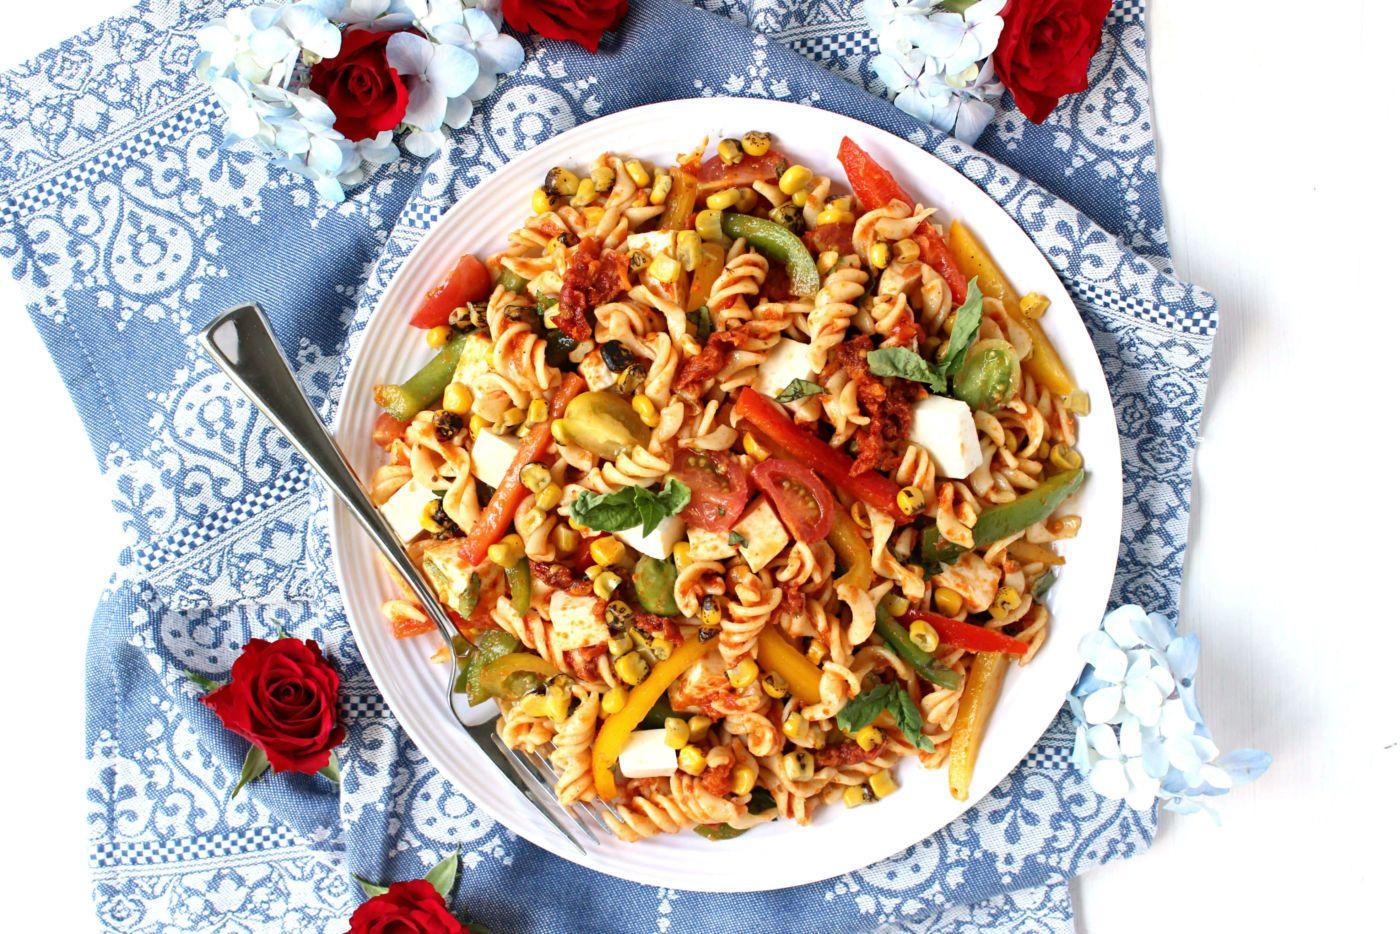 Easy Summer Harvest Pasta Salad w/ Sun-dried Tomato Purée & Smoked Mozzarella